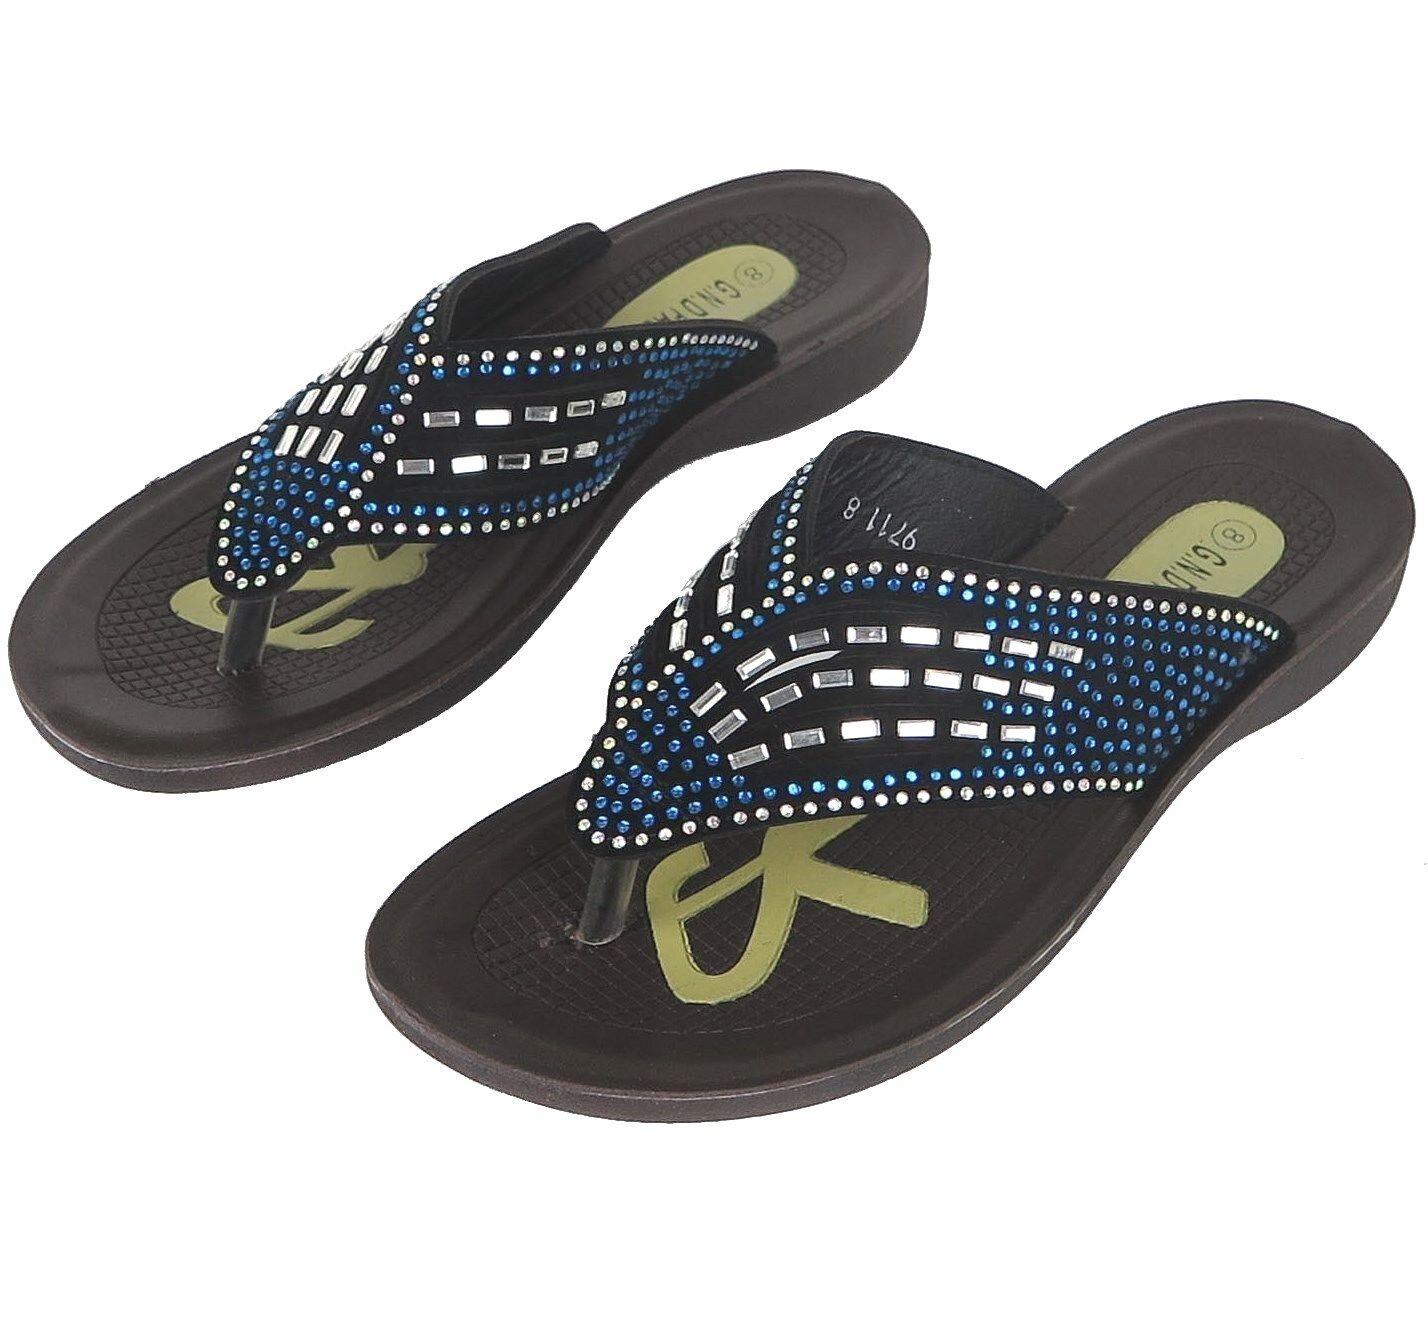 Women's Flip Flops Rhinestones Sandals Shoes w/ Blue Rhinestones Flops Sizes 5-10 New 916d88